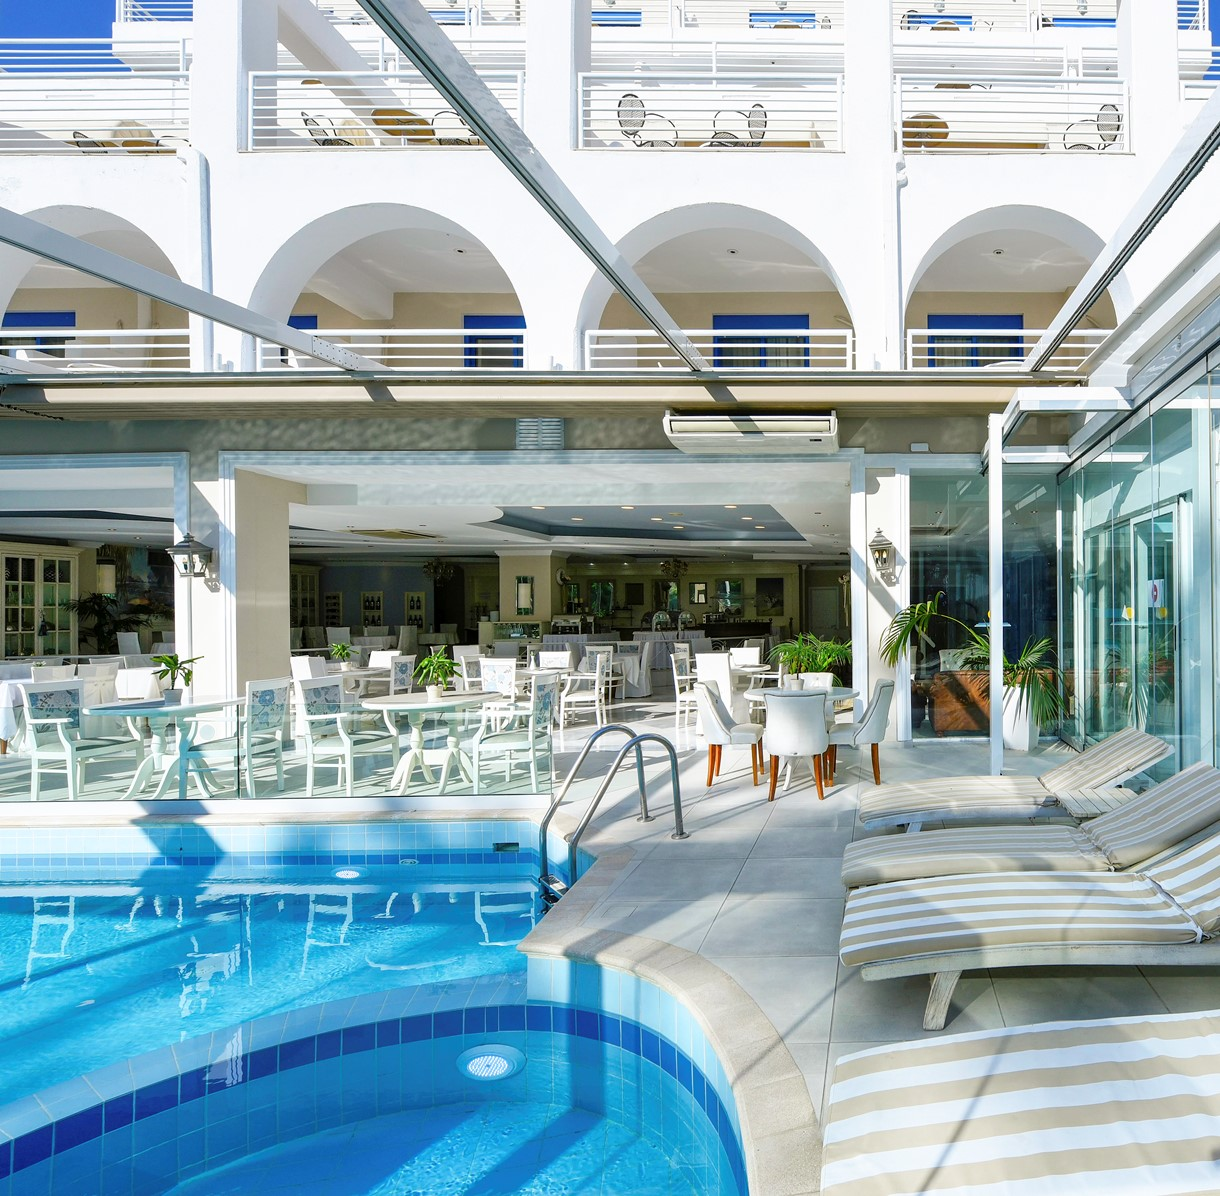 4* Secret Paradise Hotel & Spa Chalkidiki -Νέα Καλλικράτεια, Χαλκιδική εικόνα